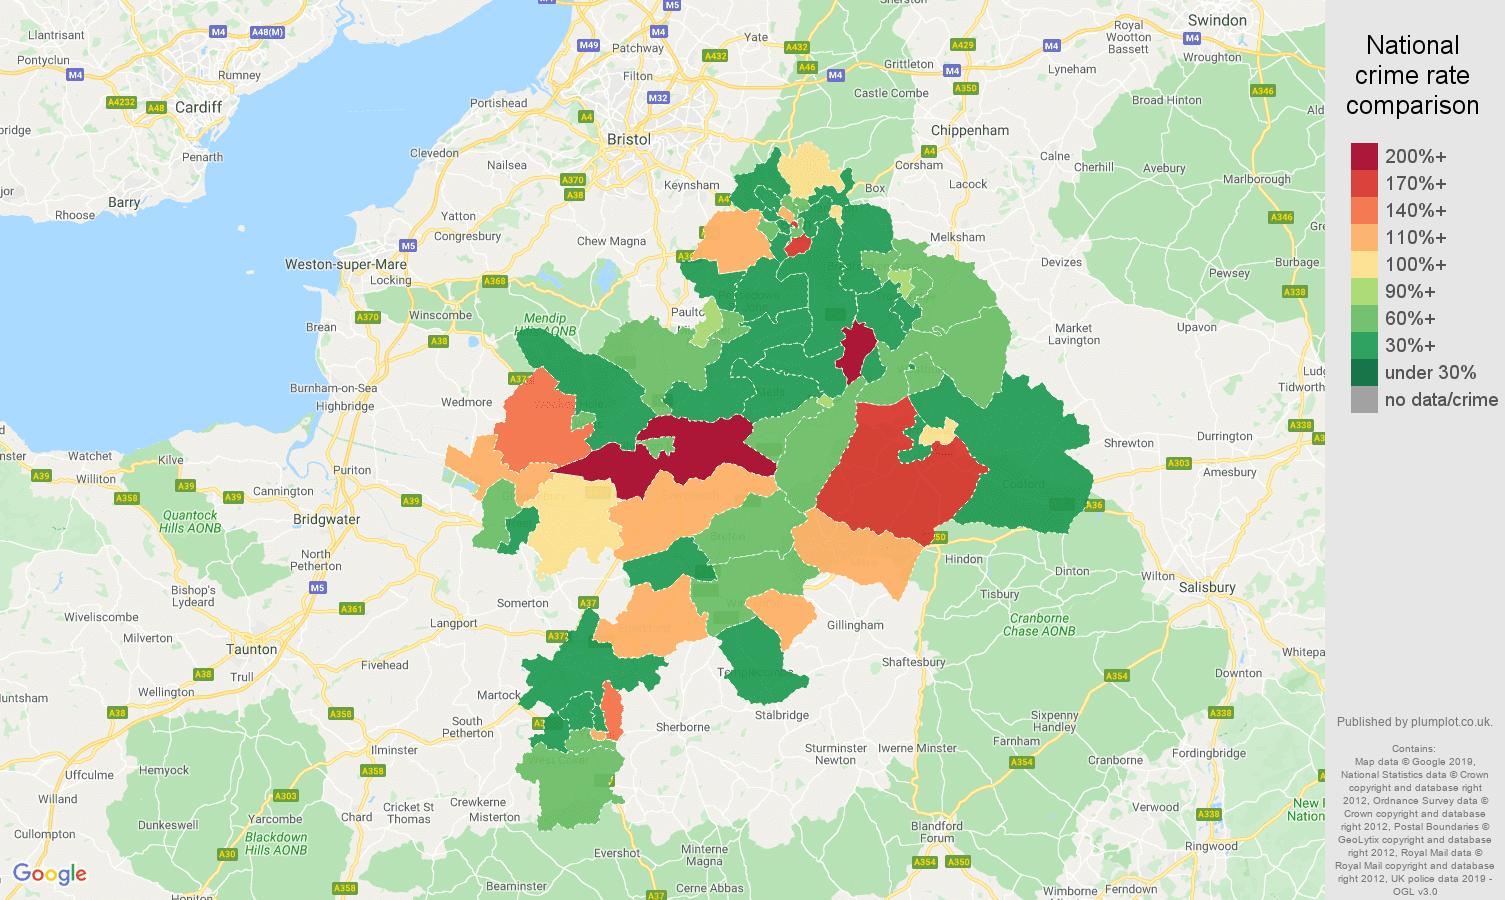 Bath other theft crime rate comparison map